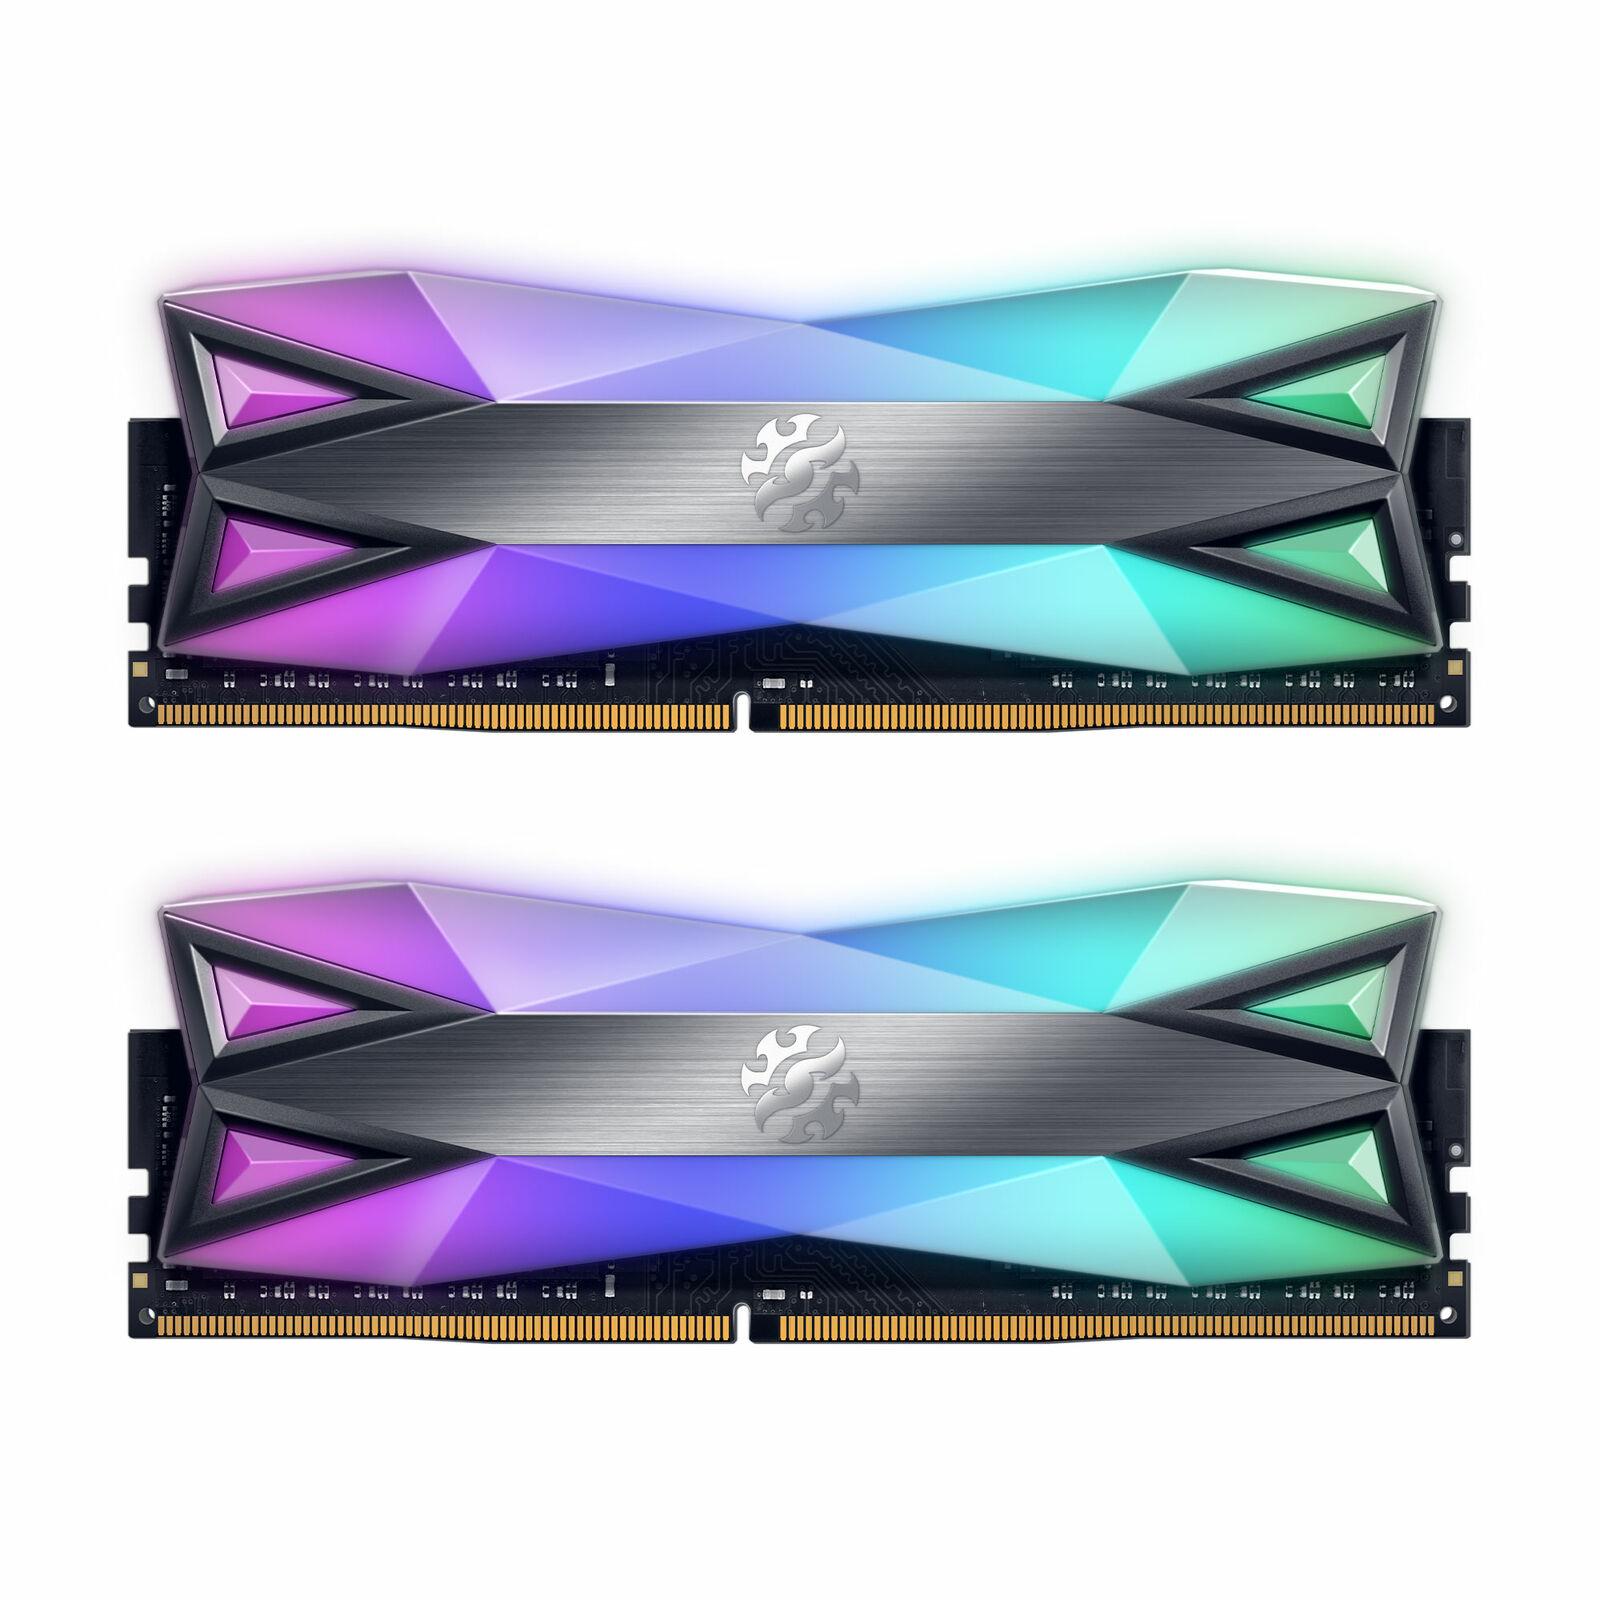 XPG SPECTRIX D60G RGB Desktop Memory Series: 32GB (2x16GB) DDR4 3000MHz CL16. Buy it now for 134.99